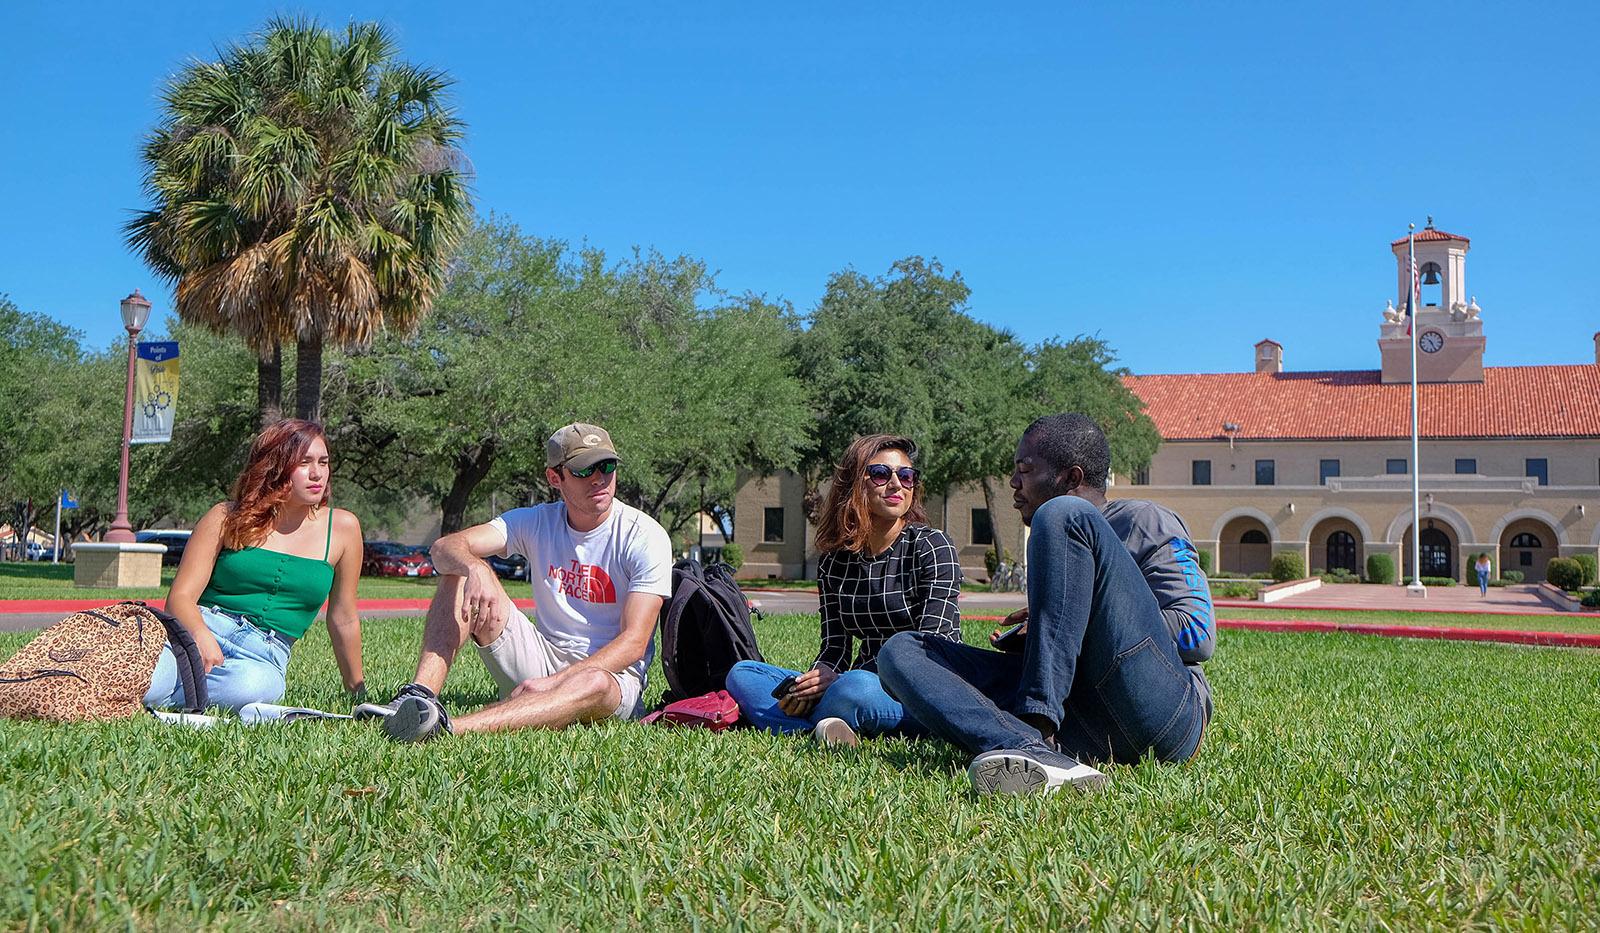 Photo Of Students socializing on University Blvd